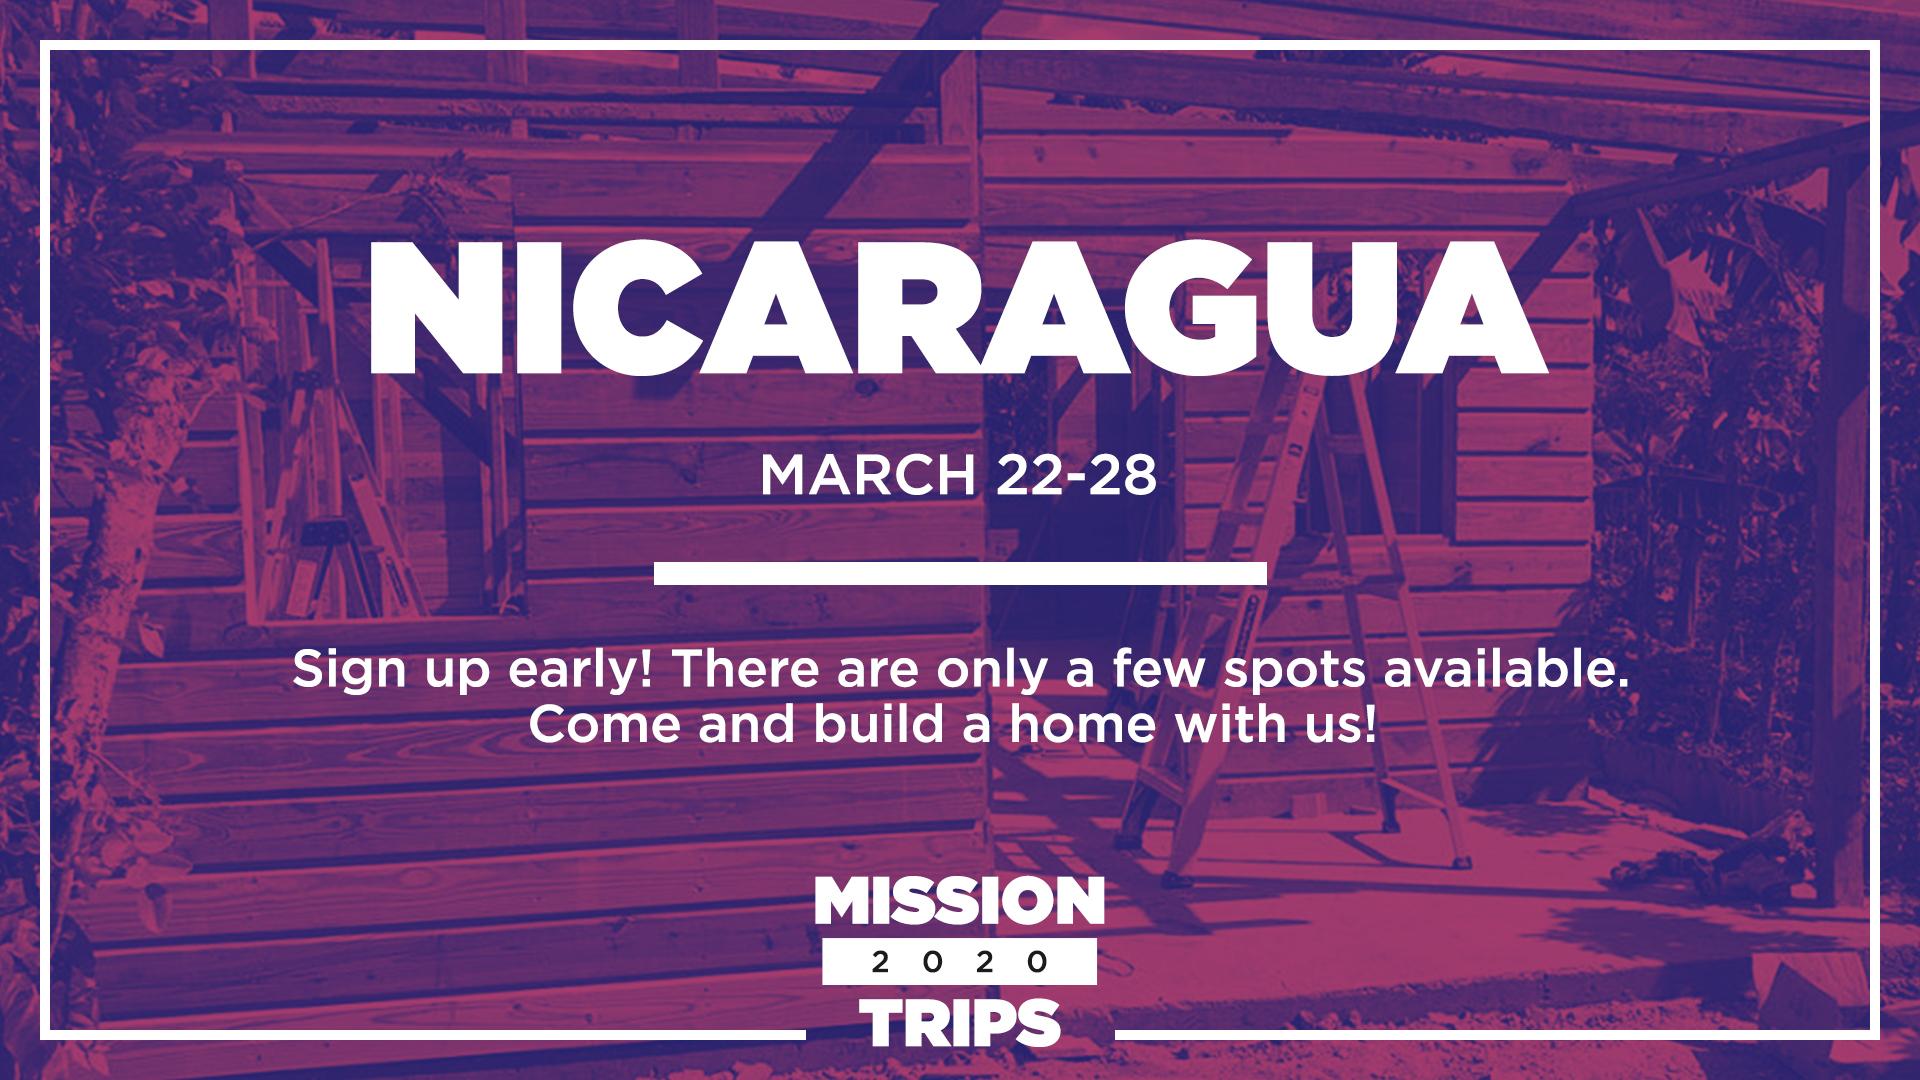 mission-trip-ads-Nicaragua.jpg